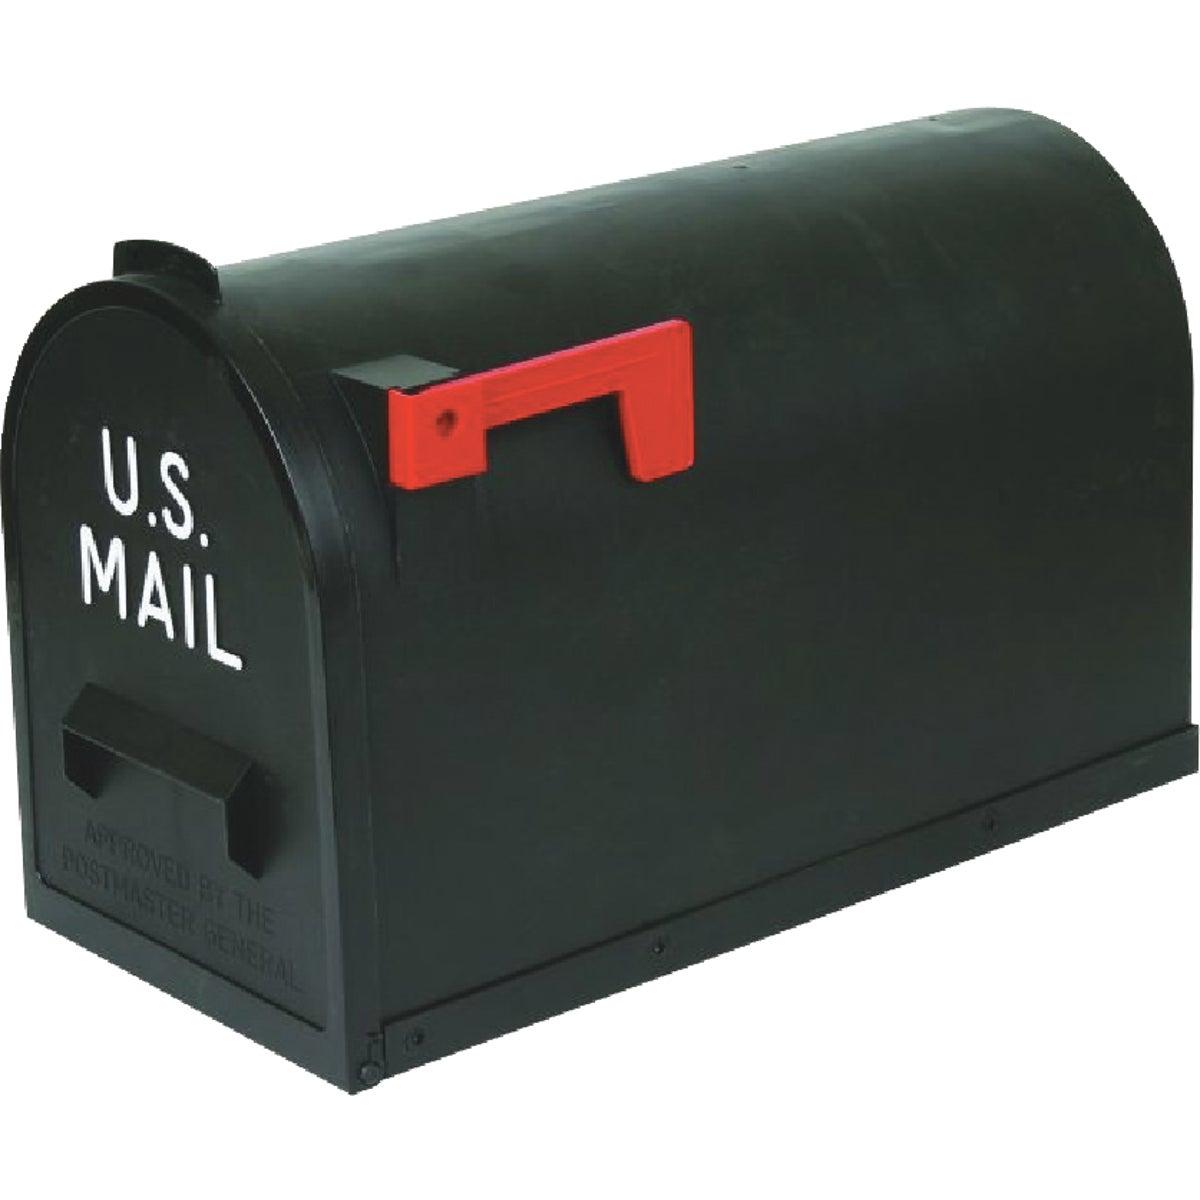 #2 Black Poly Mailbox